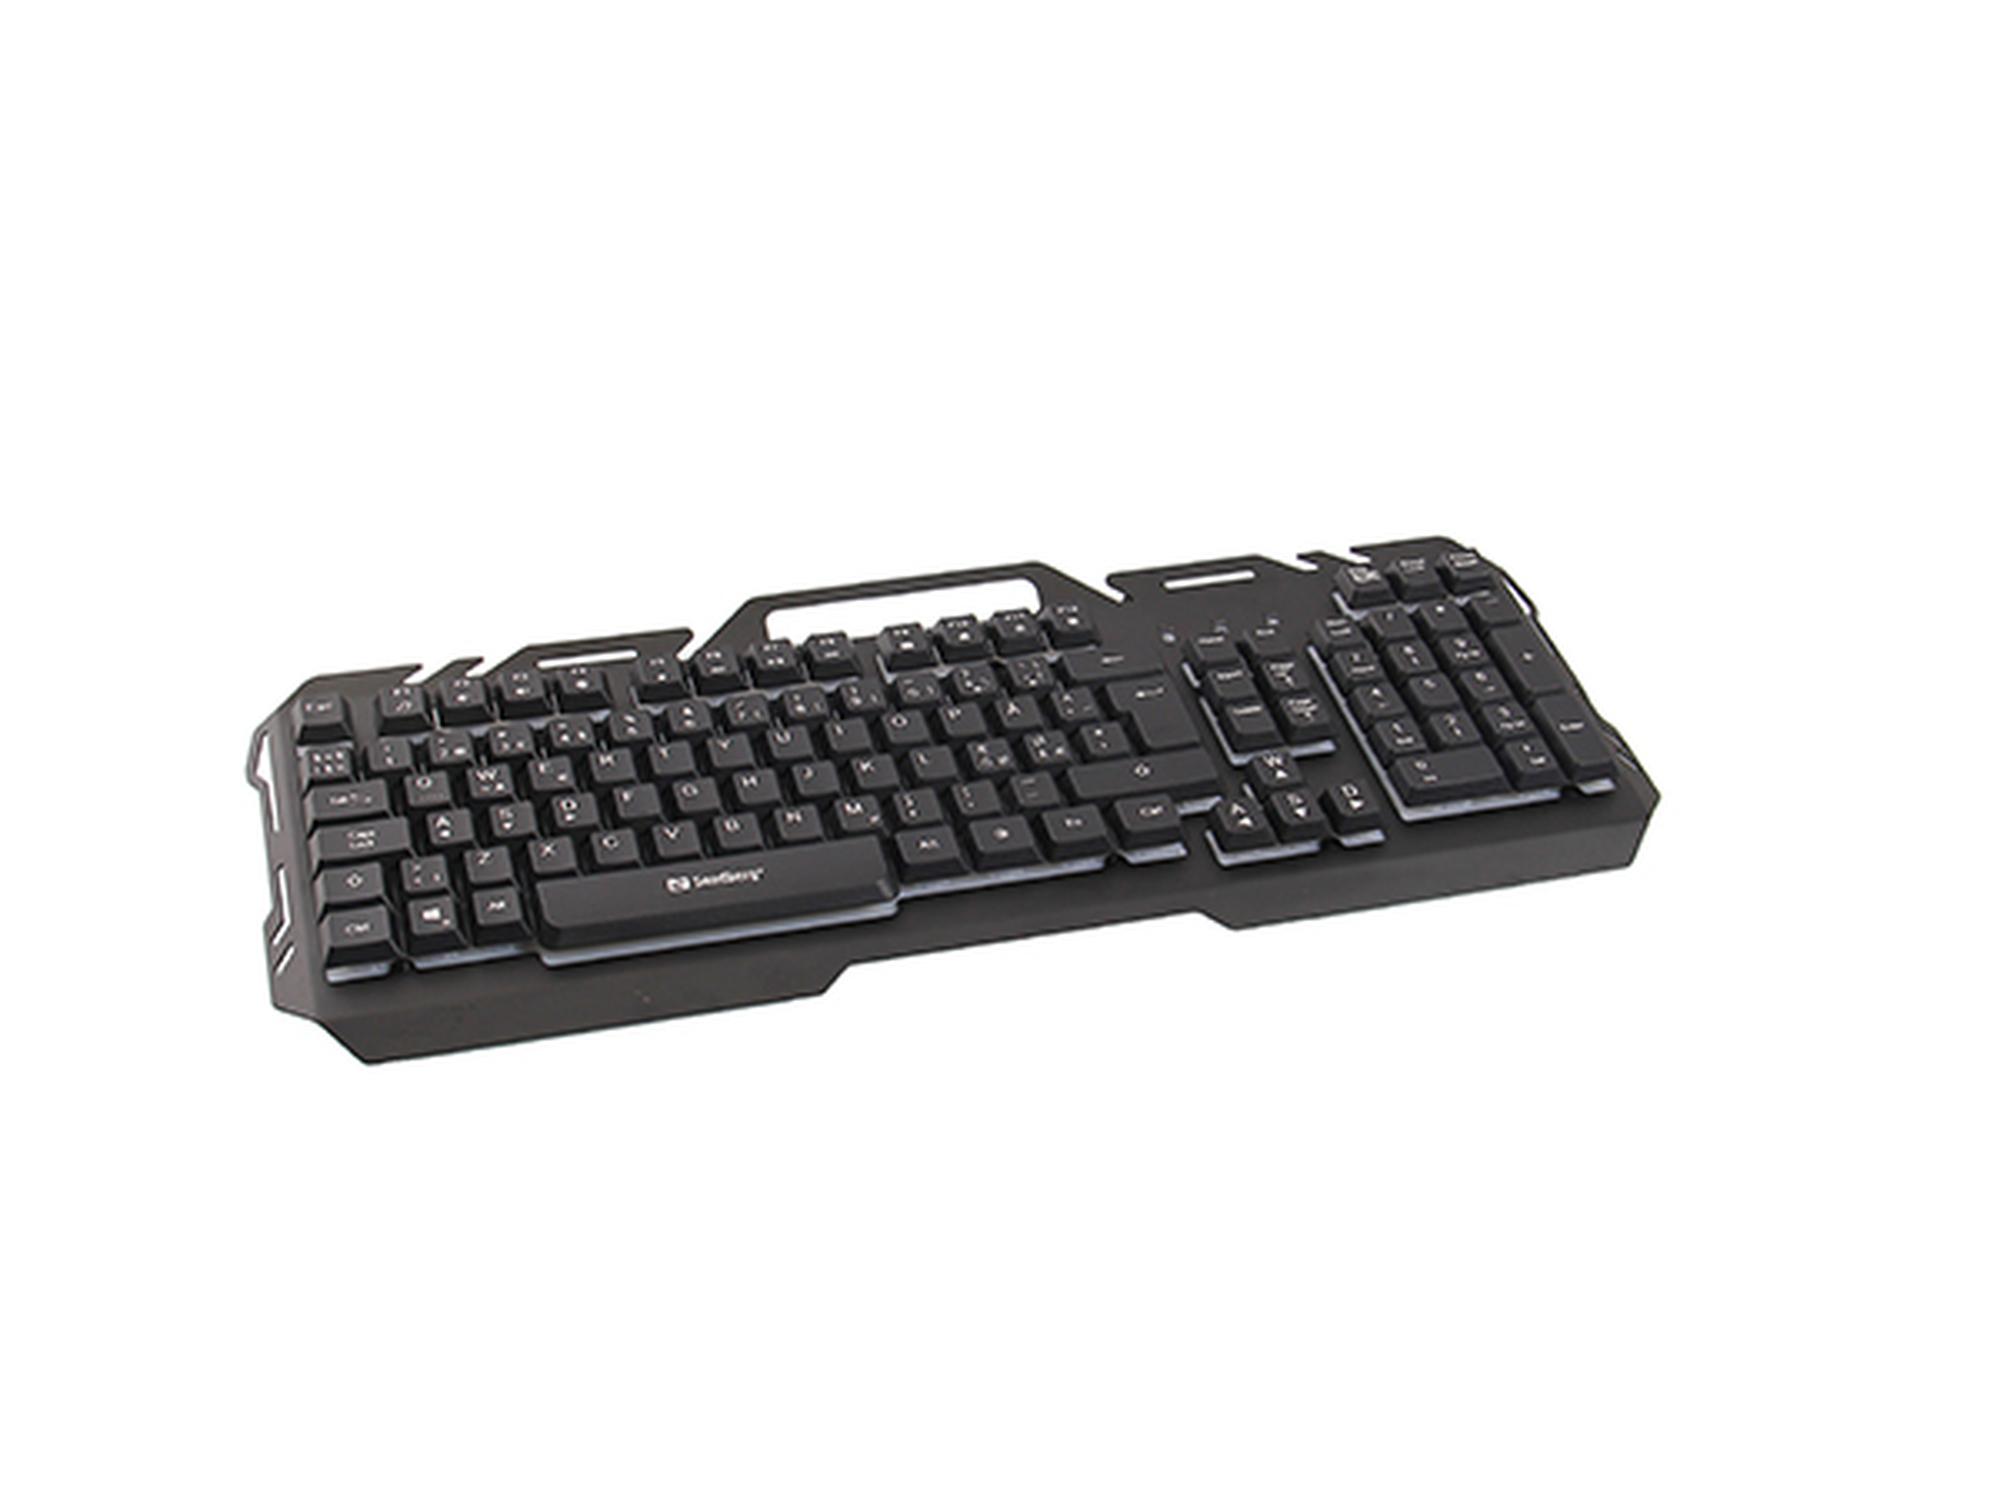 Sandberg 640-14 toetsenborden